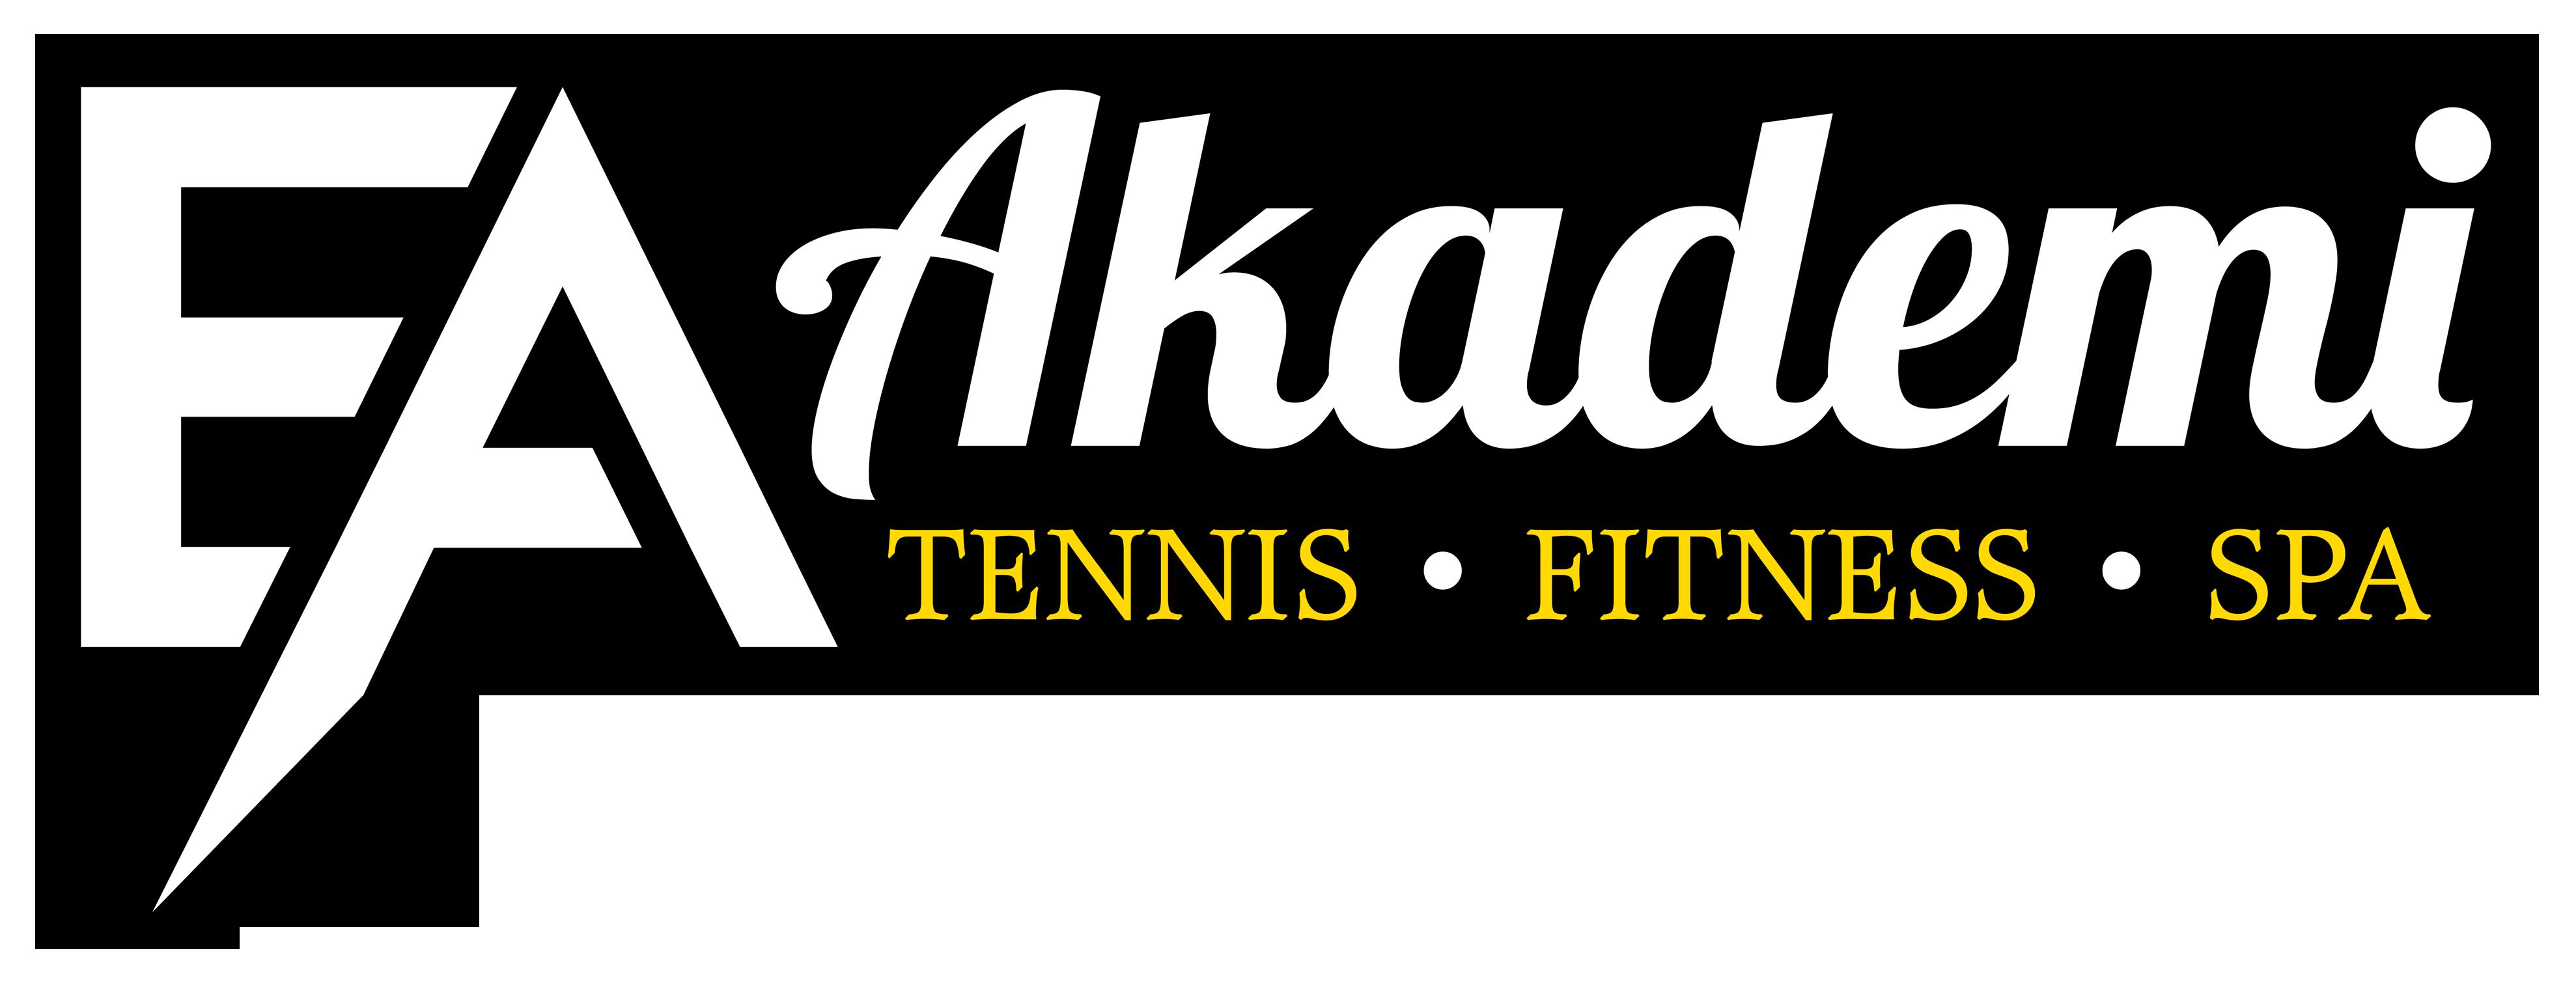 EA Aydın Tenis Akademisi - Tenis Kulübü